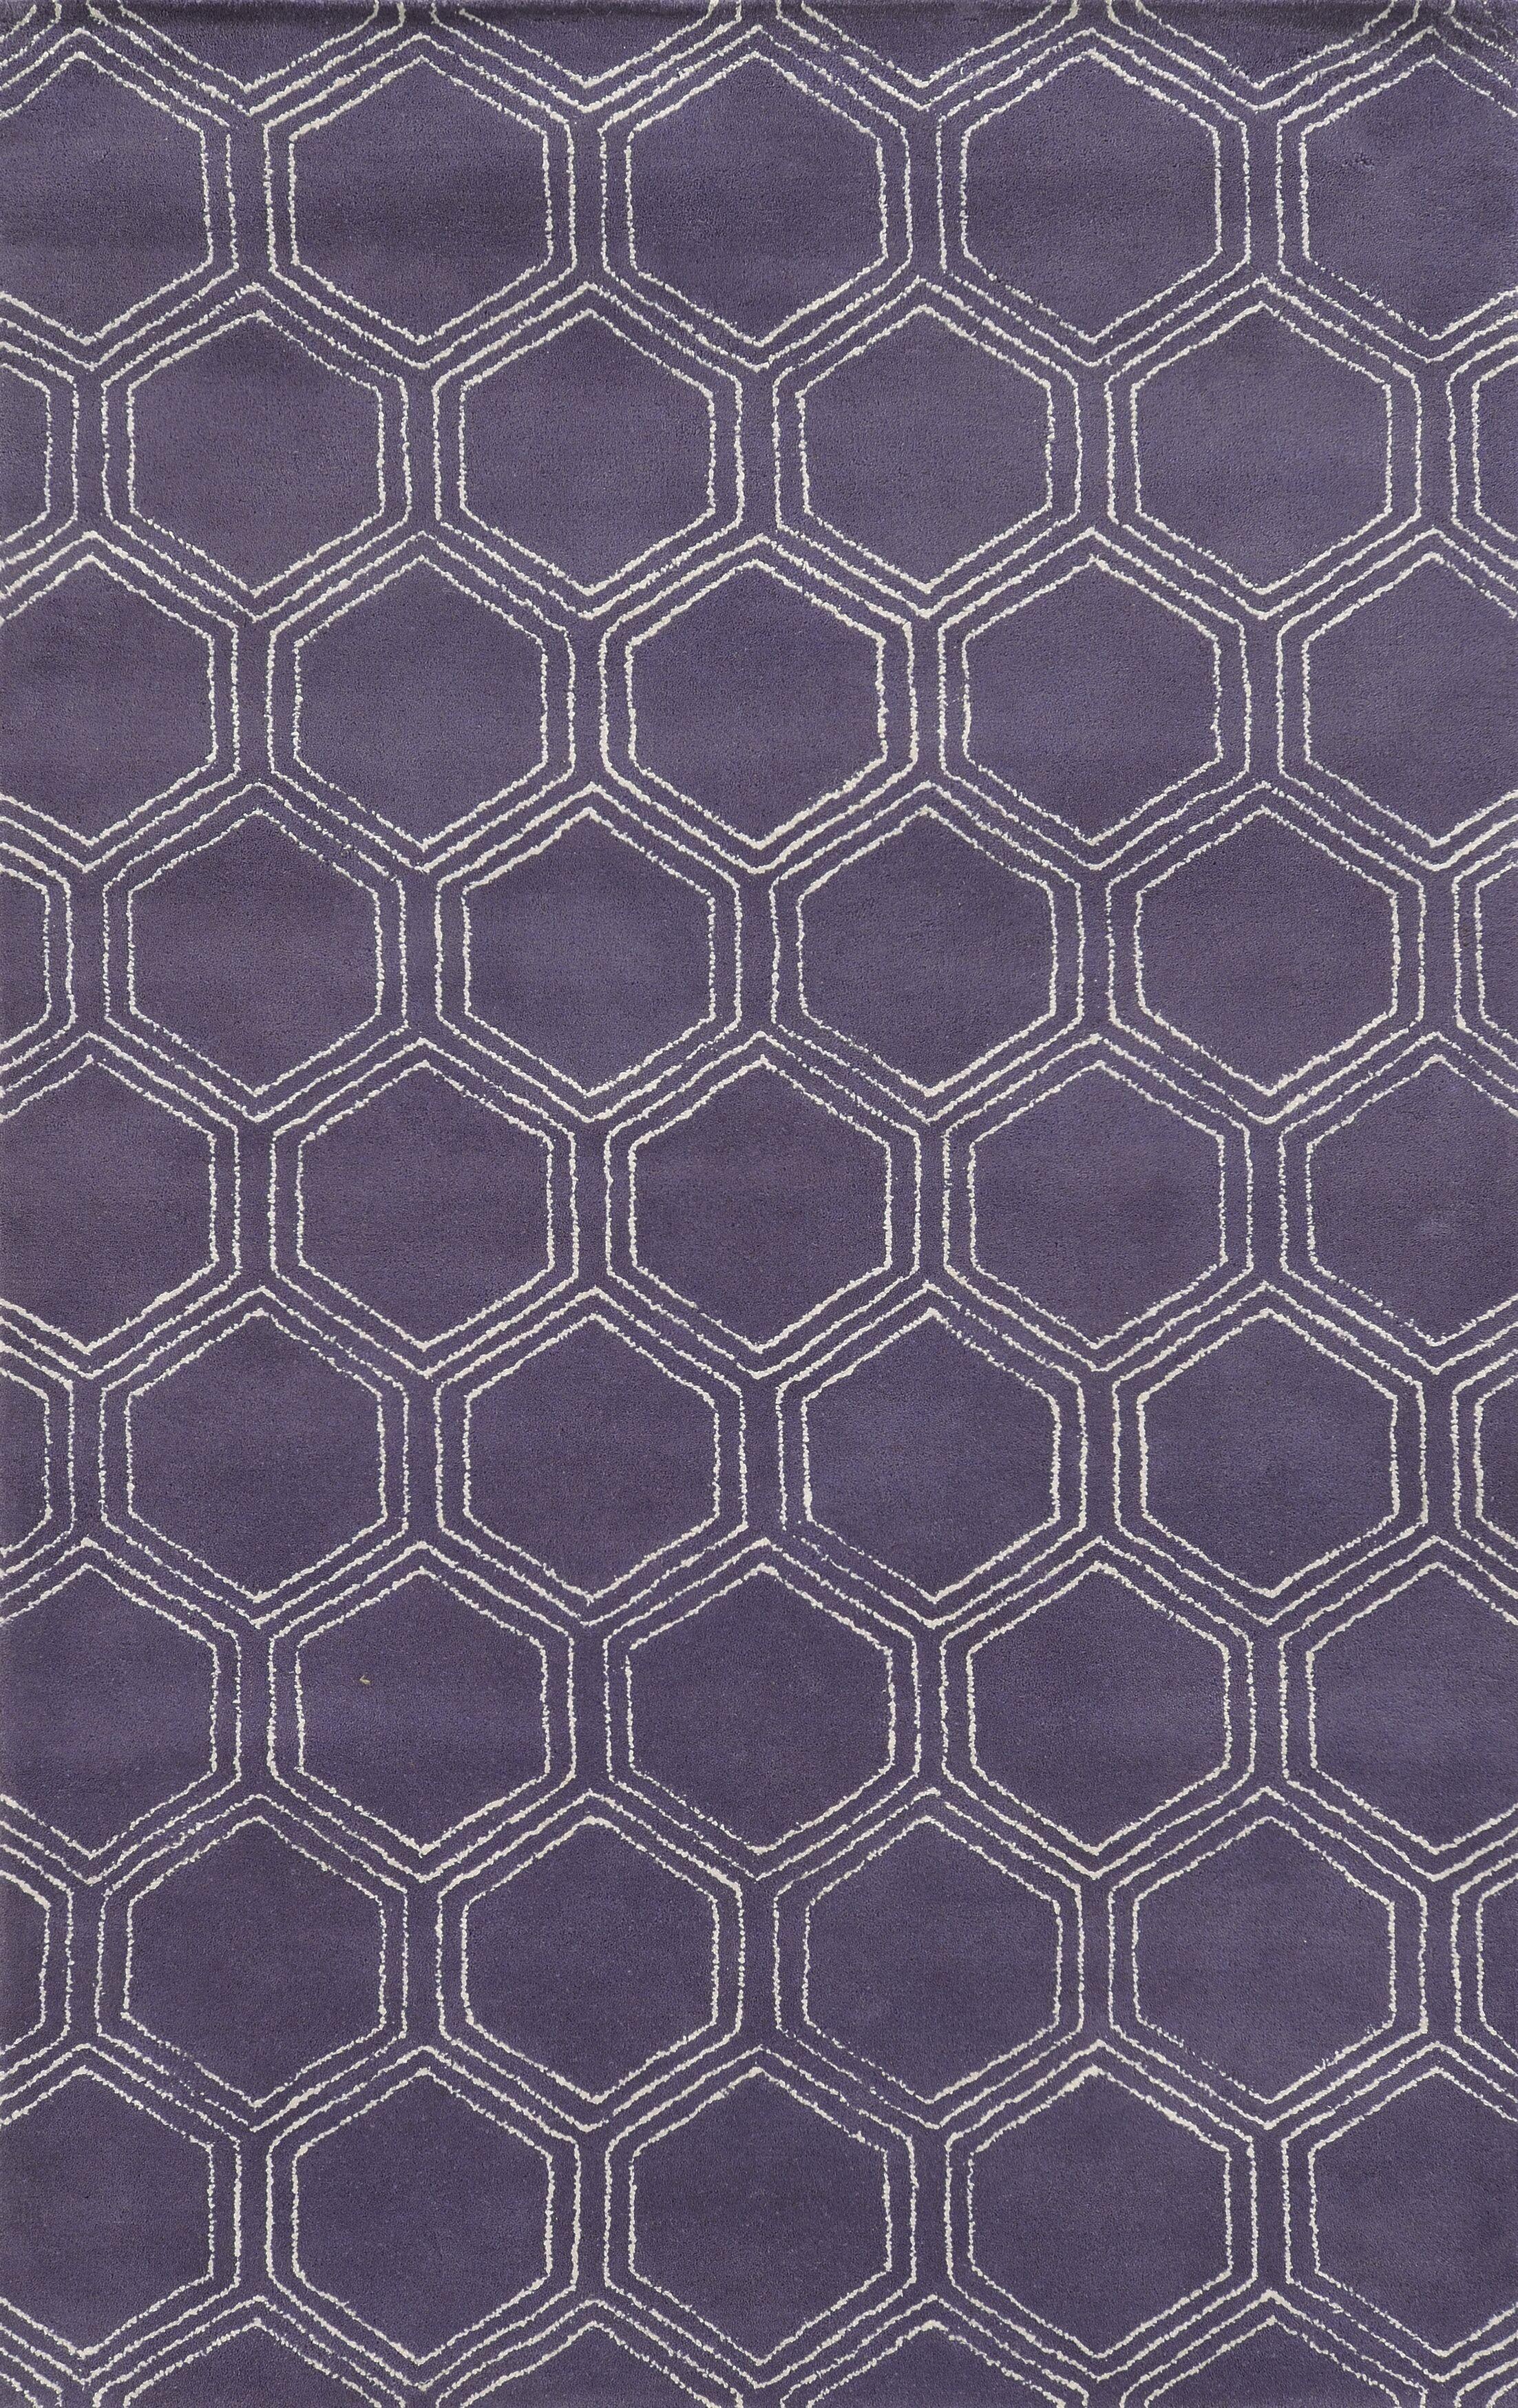 Tamaulipas Hand-Tufted Purple Area Rug Rug Size: Rectangle 8' x 10'